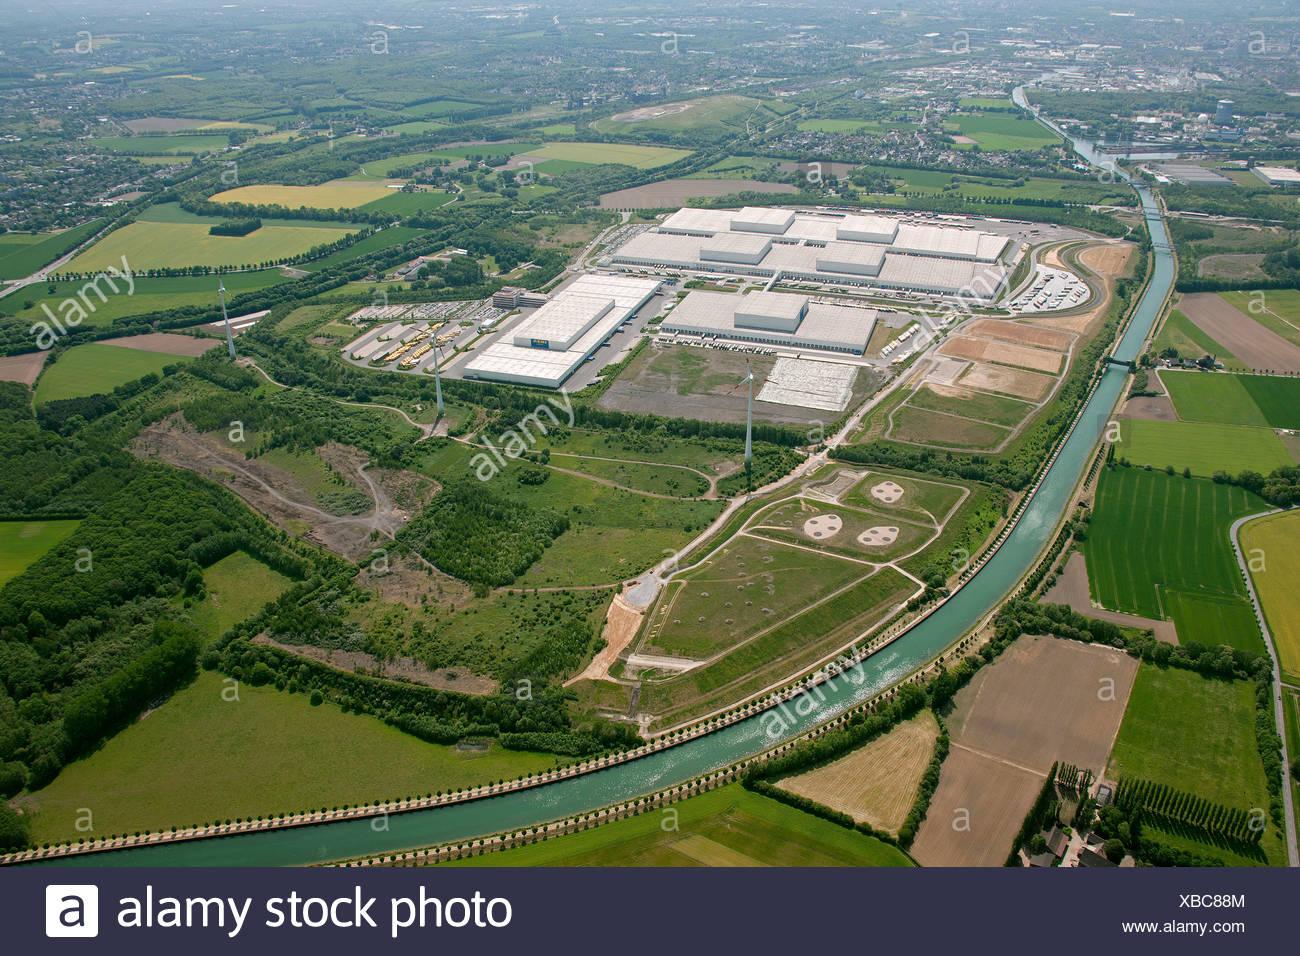 Aerial view, nature protection, compensation areas for the Logistik-Park Westfalenhuette logistics park on the Ellinghausen - Stock Image